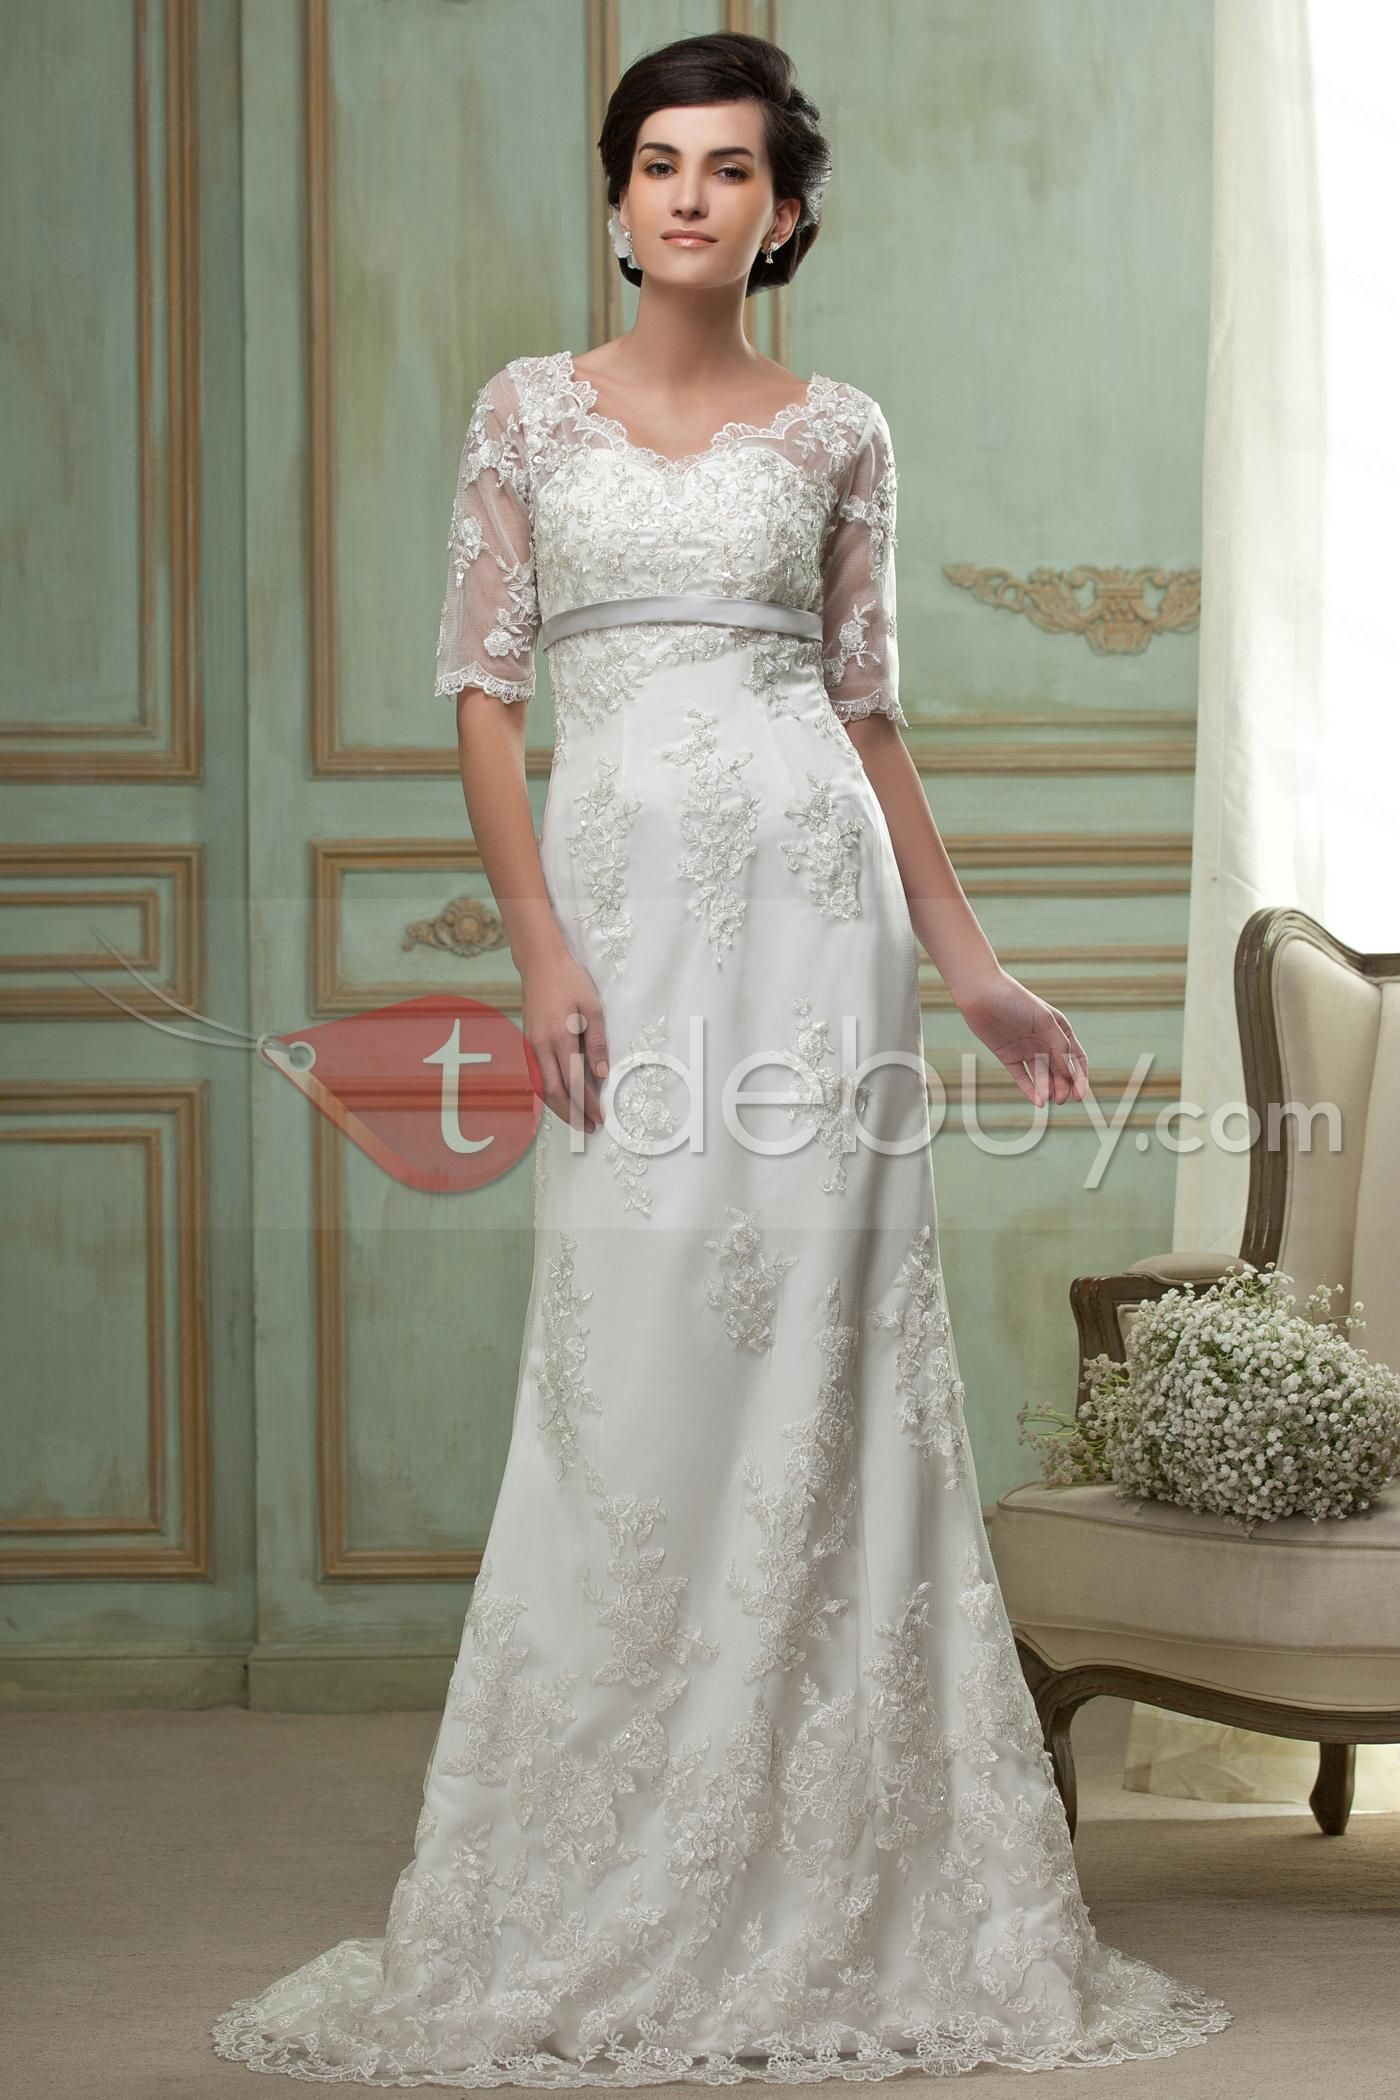 Elegant sheathcolumn vneck halfsleeve floorlength lace wedding